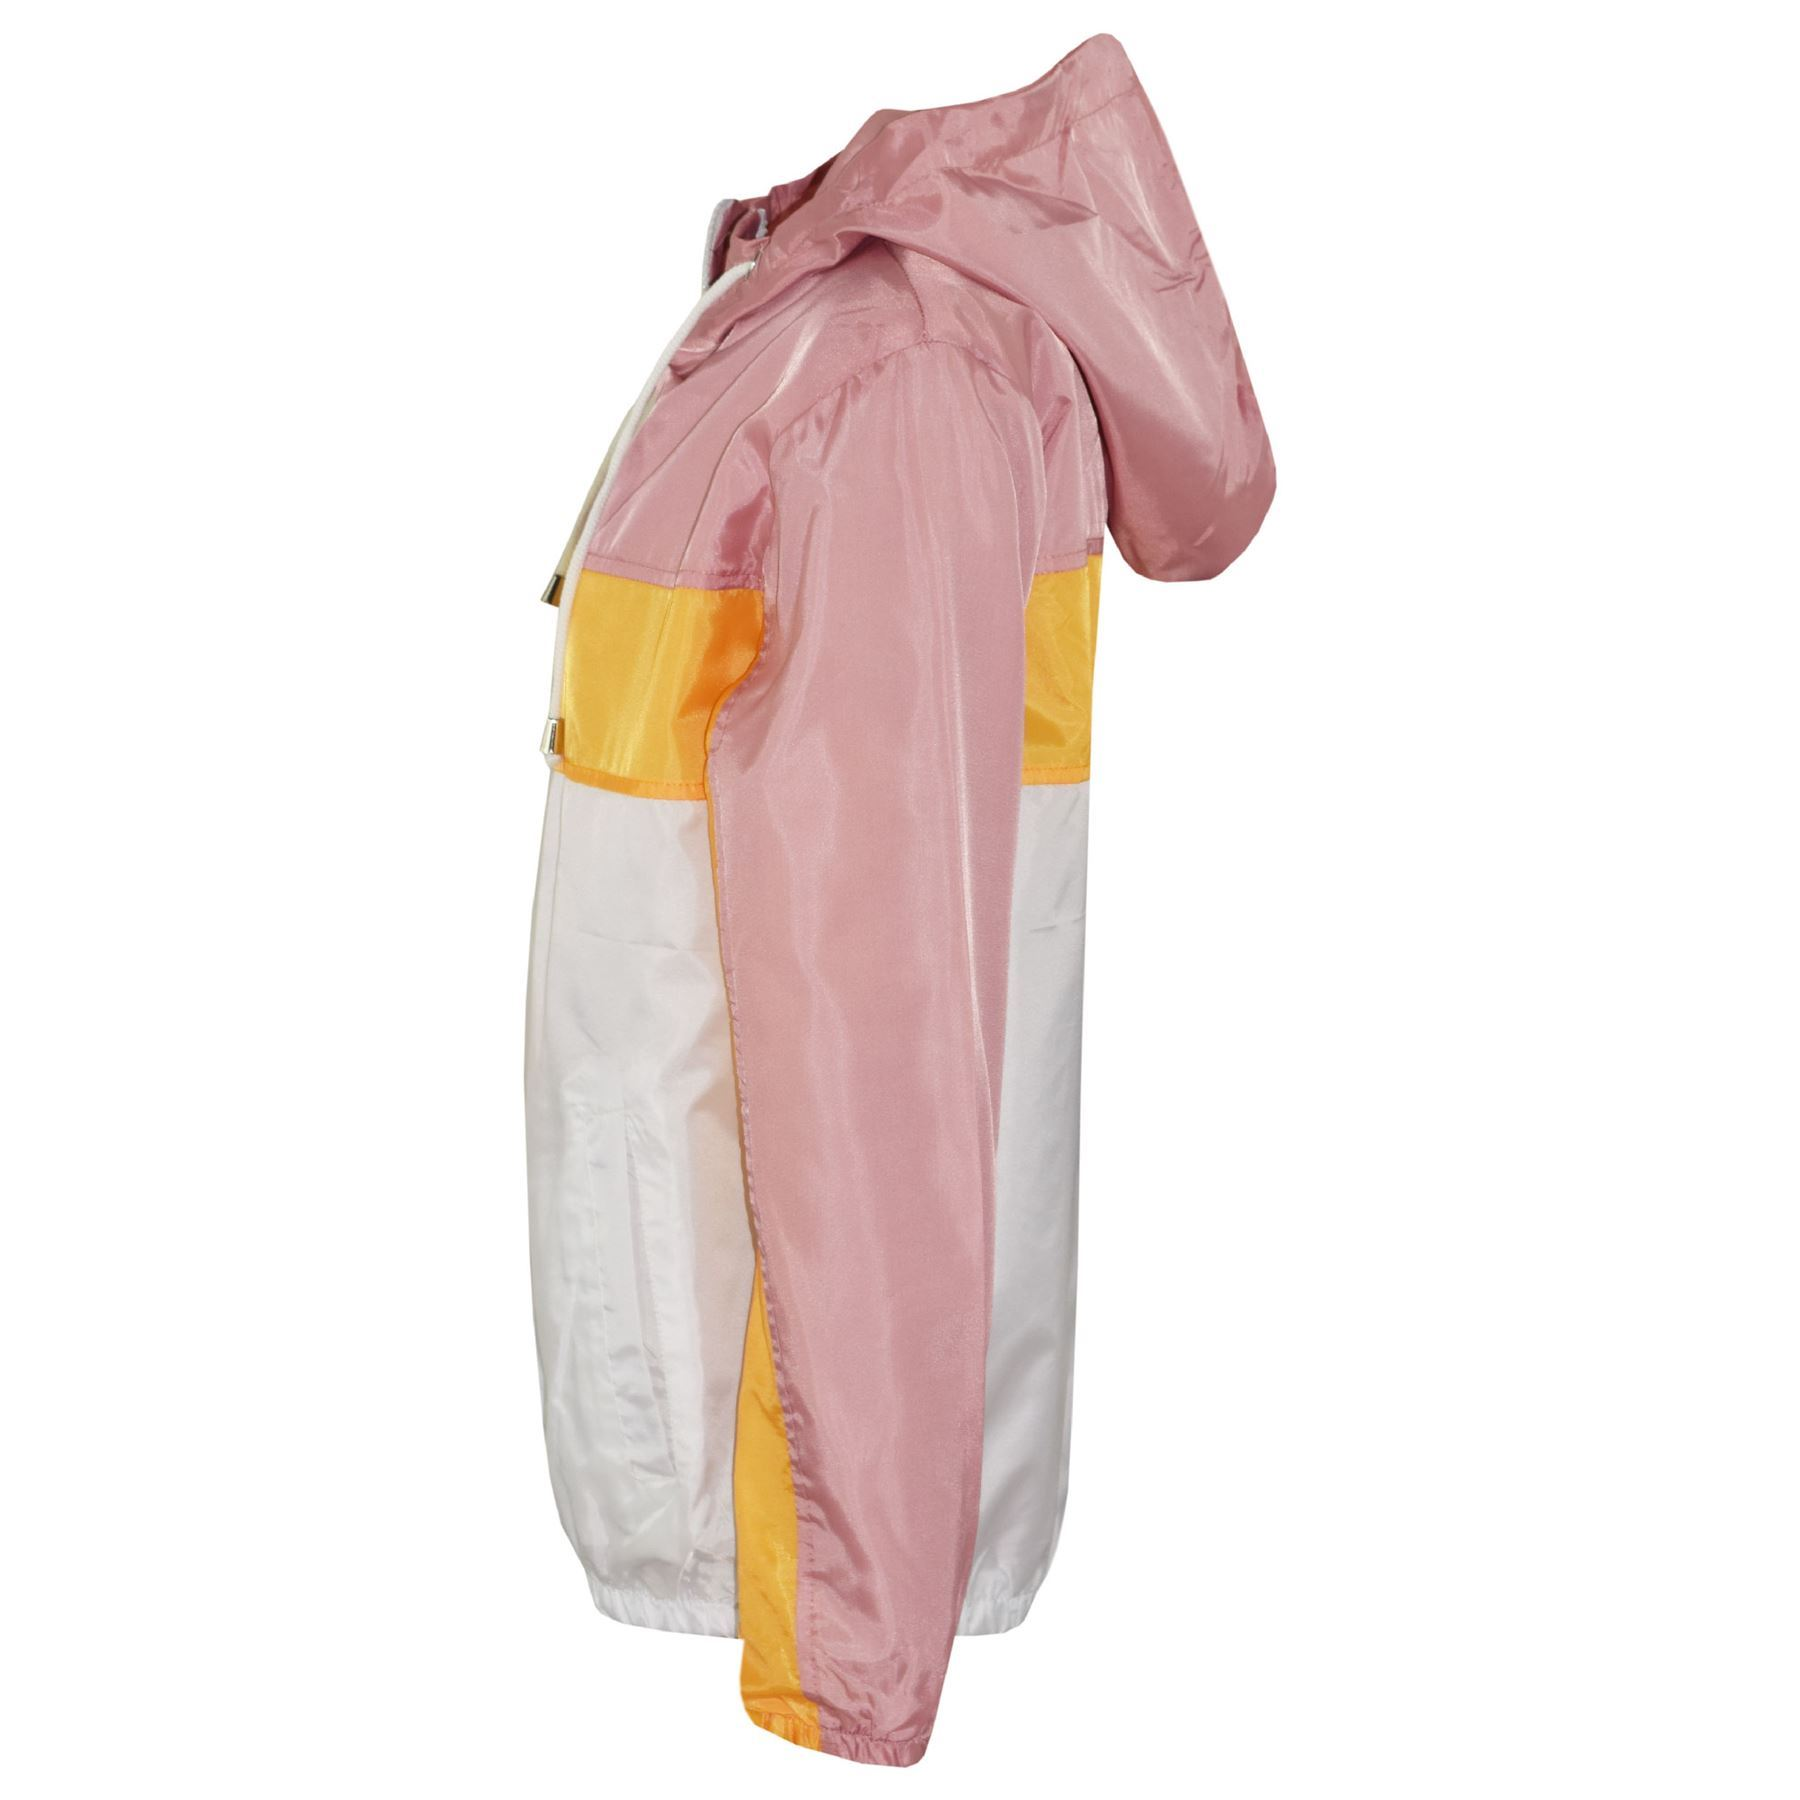 Kids-Boys-Girls-Windbreaker-Contrast-Block-Hooded-Jackets-Rain-Mac-Raincoat-5-13 thumbnail 4